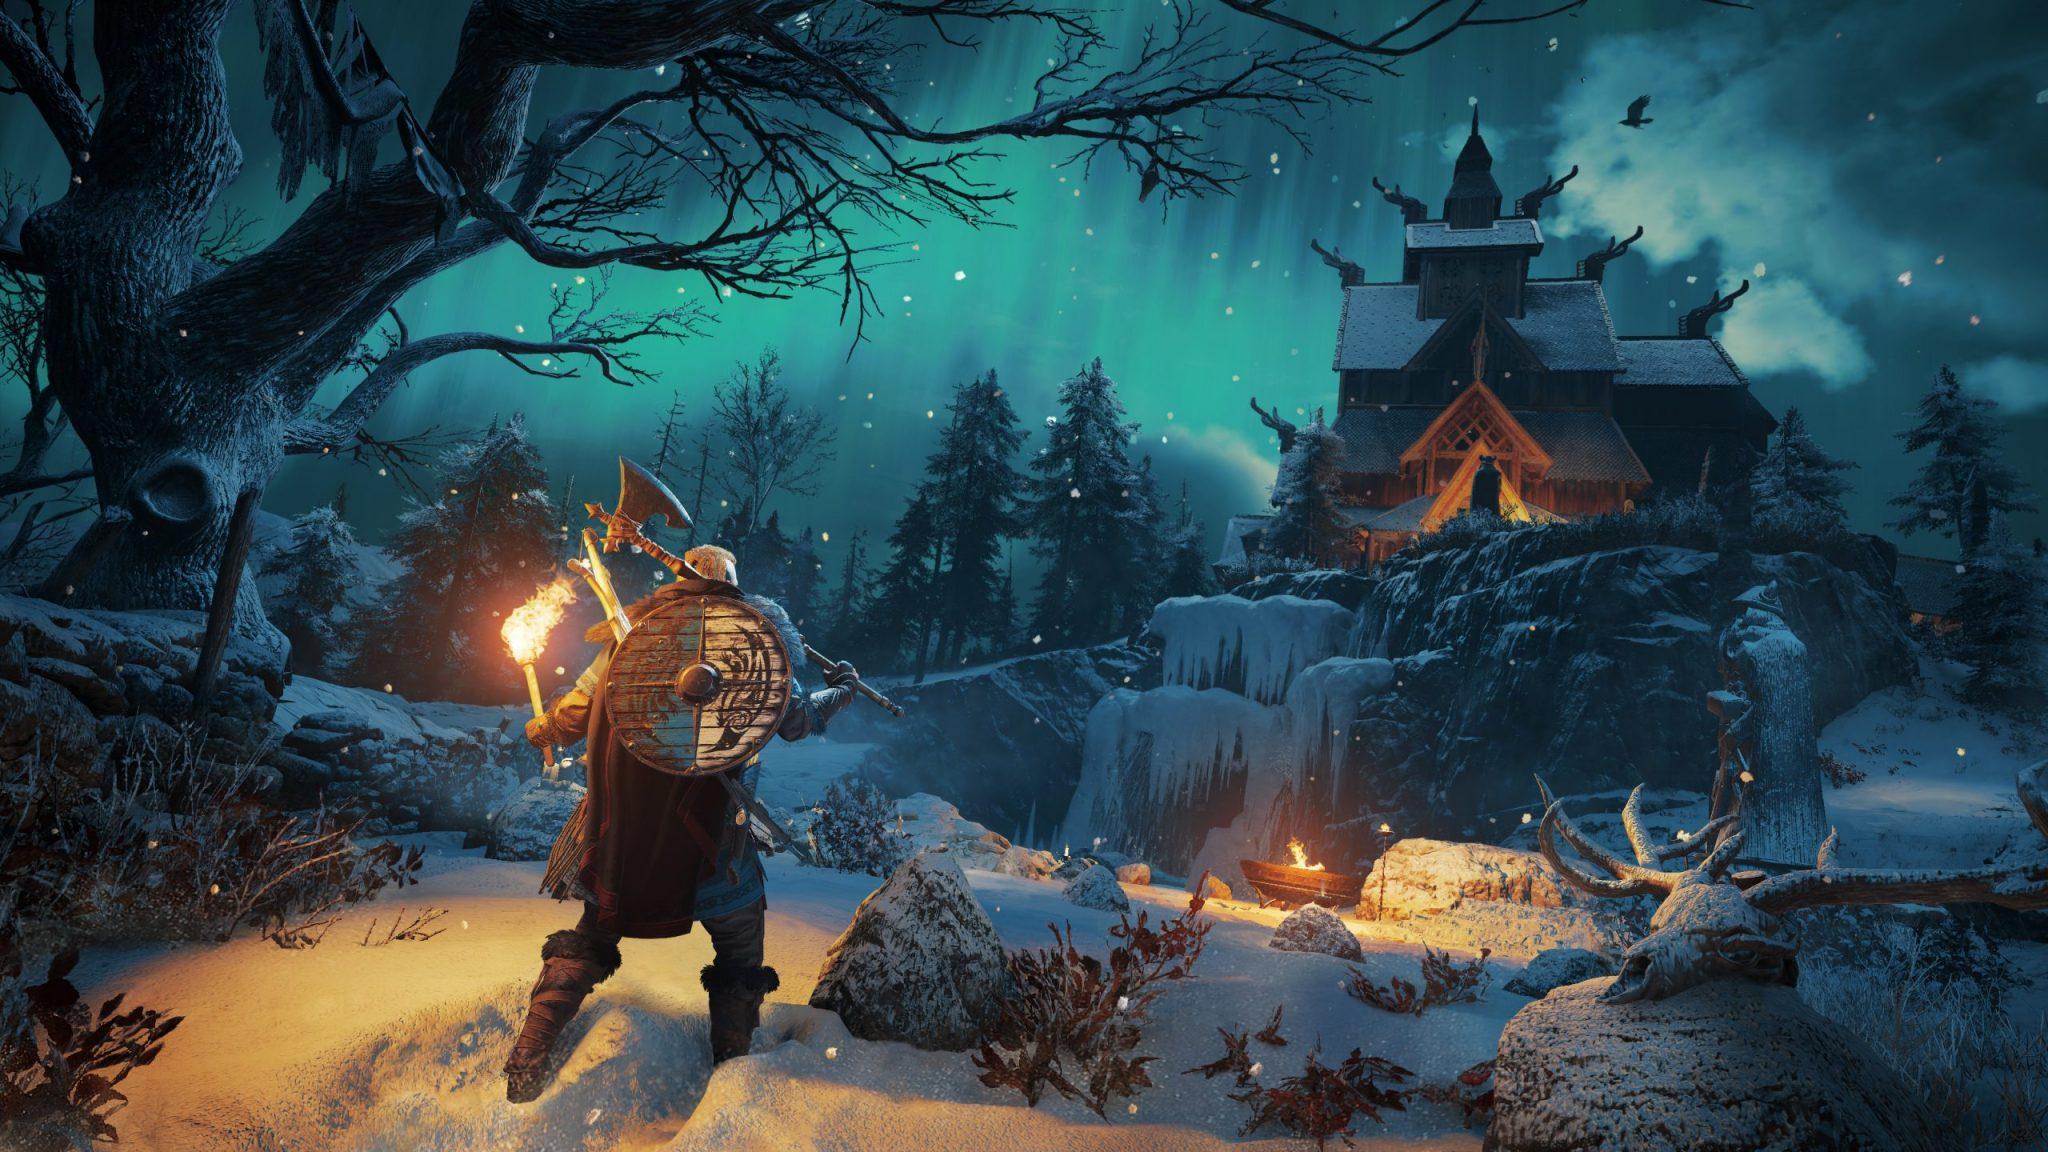 Ubisoft Assassin's Creed Valhalla